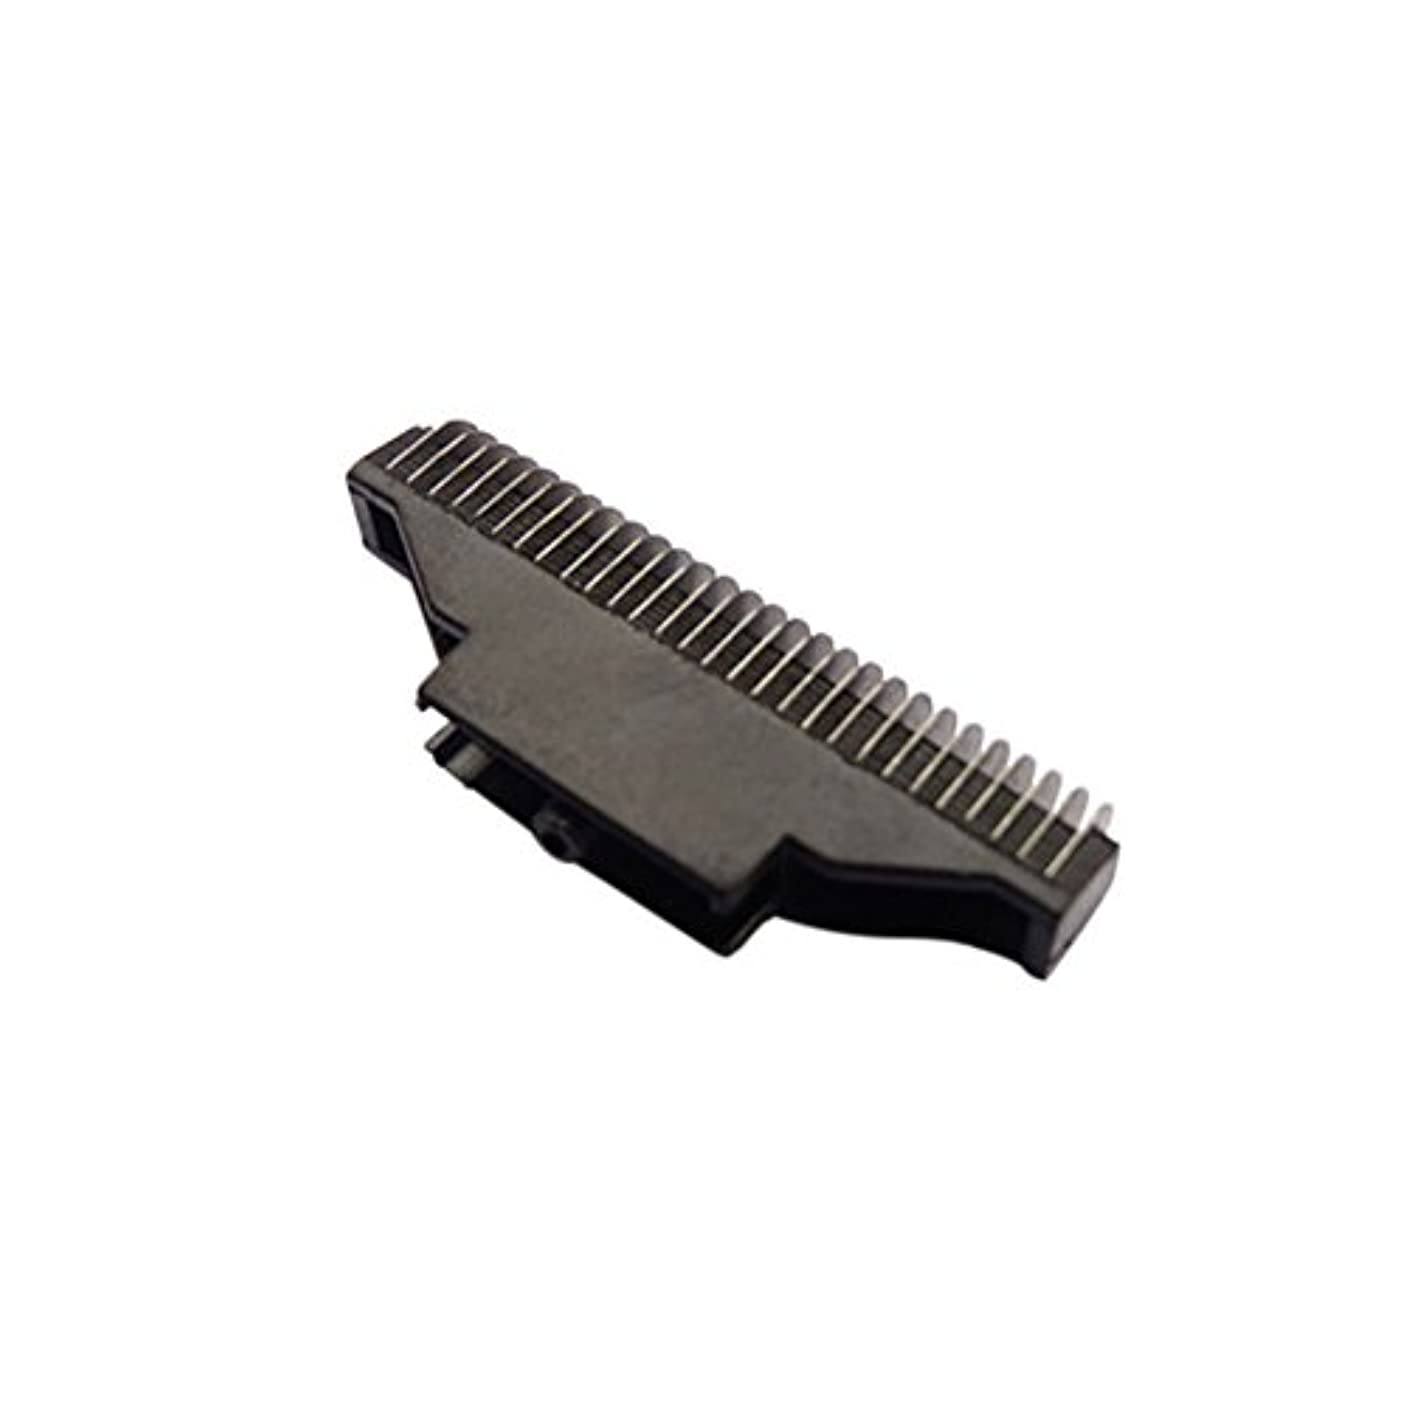 HZjundasi Replacement Inner ブレード コンボ for Panasonic ES4026/25/27 ES4853 ES9852